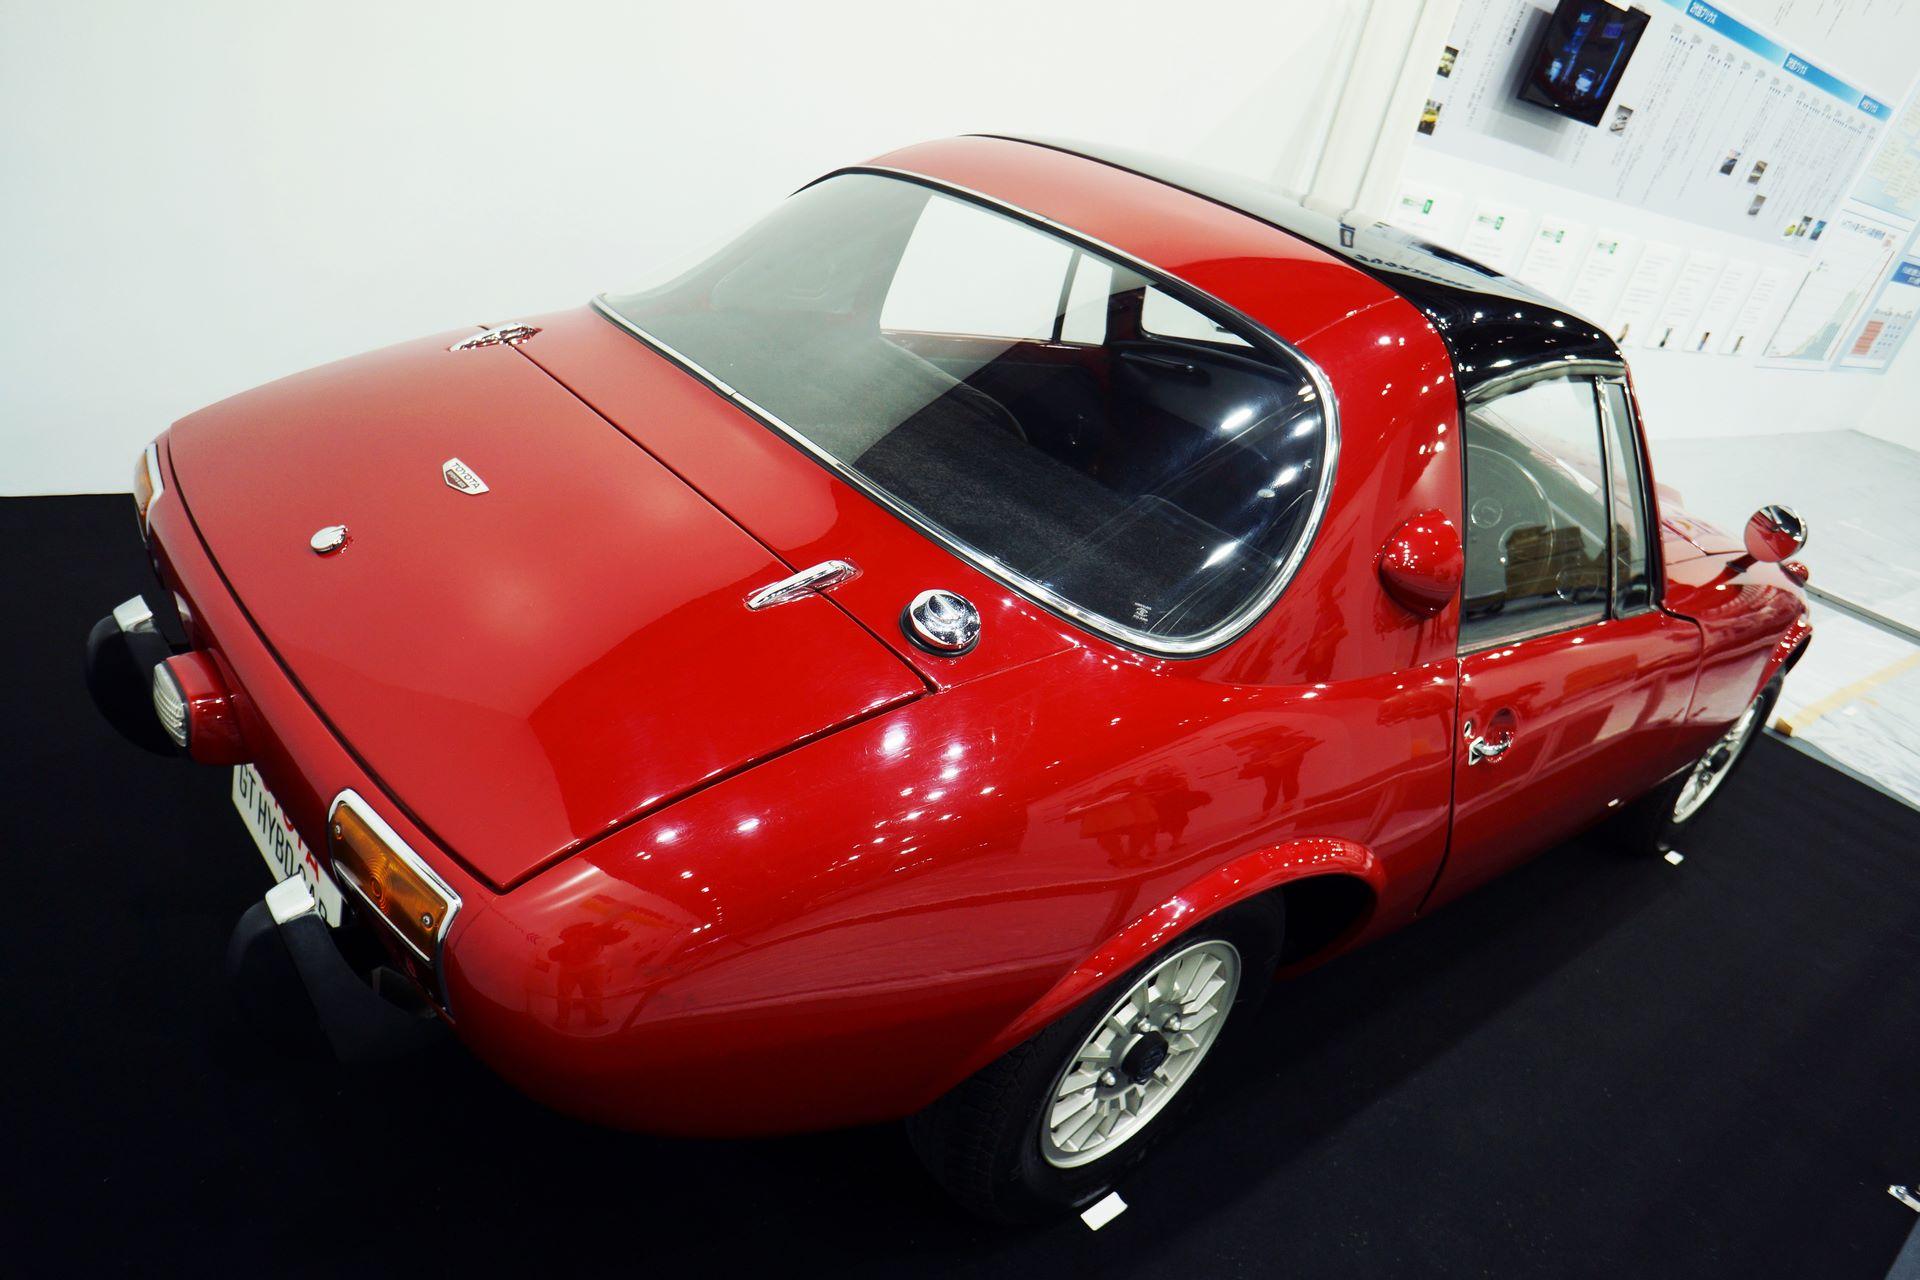 Toyota-Sports-800-Gas-Turbine-Hybrid-concept-1977-7